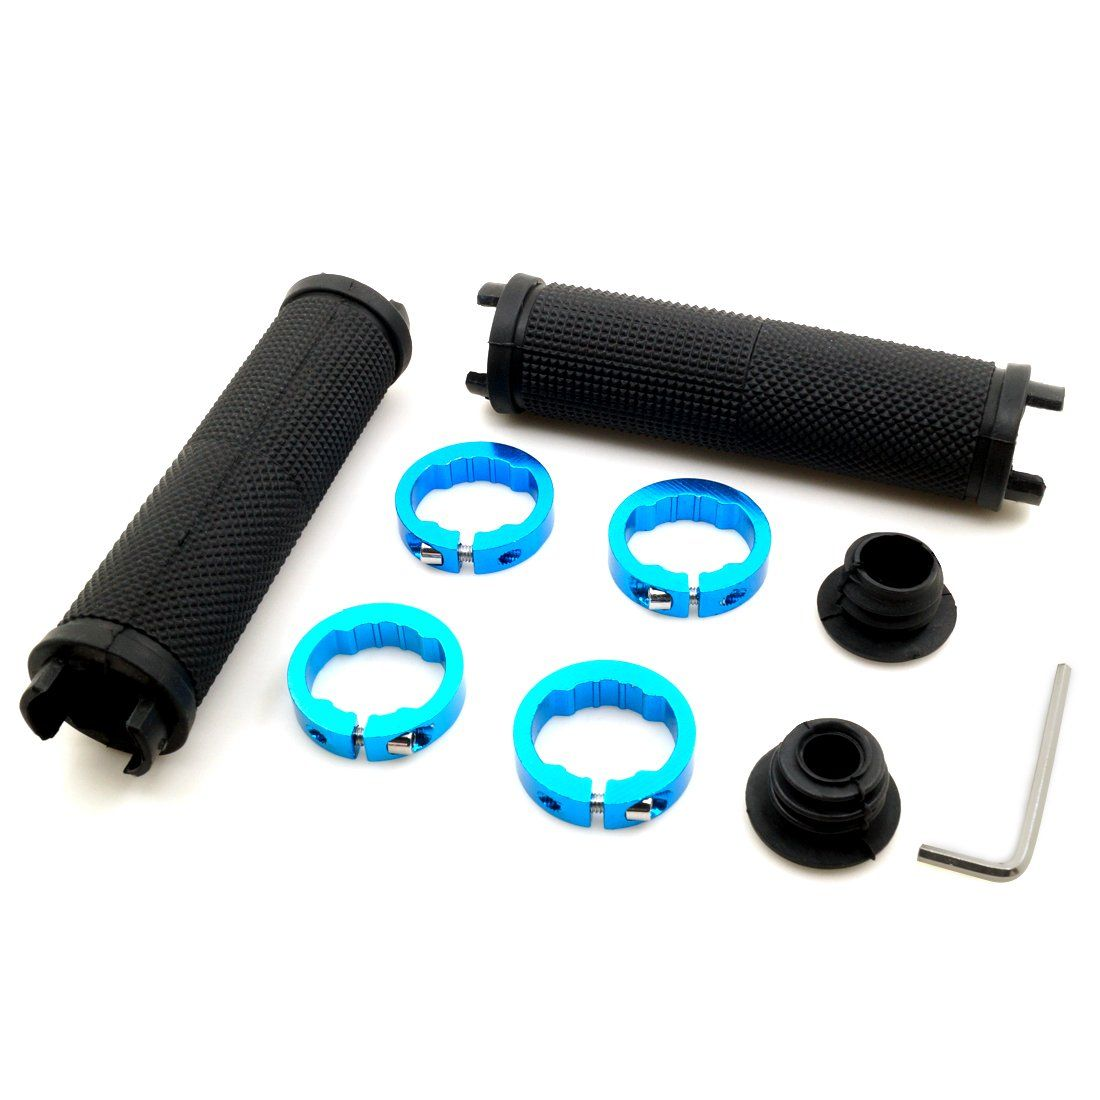 Non-Slip-Rubber Bicycle Handle Grip with Aluminum Lock Bike Handlebar